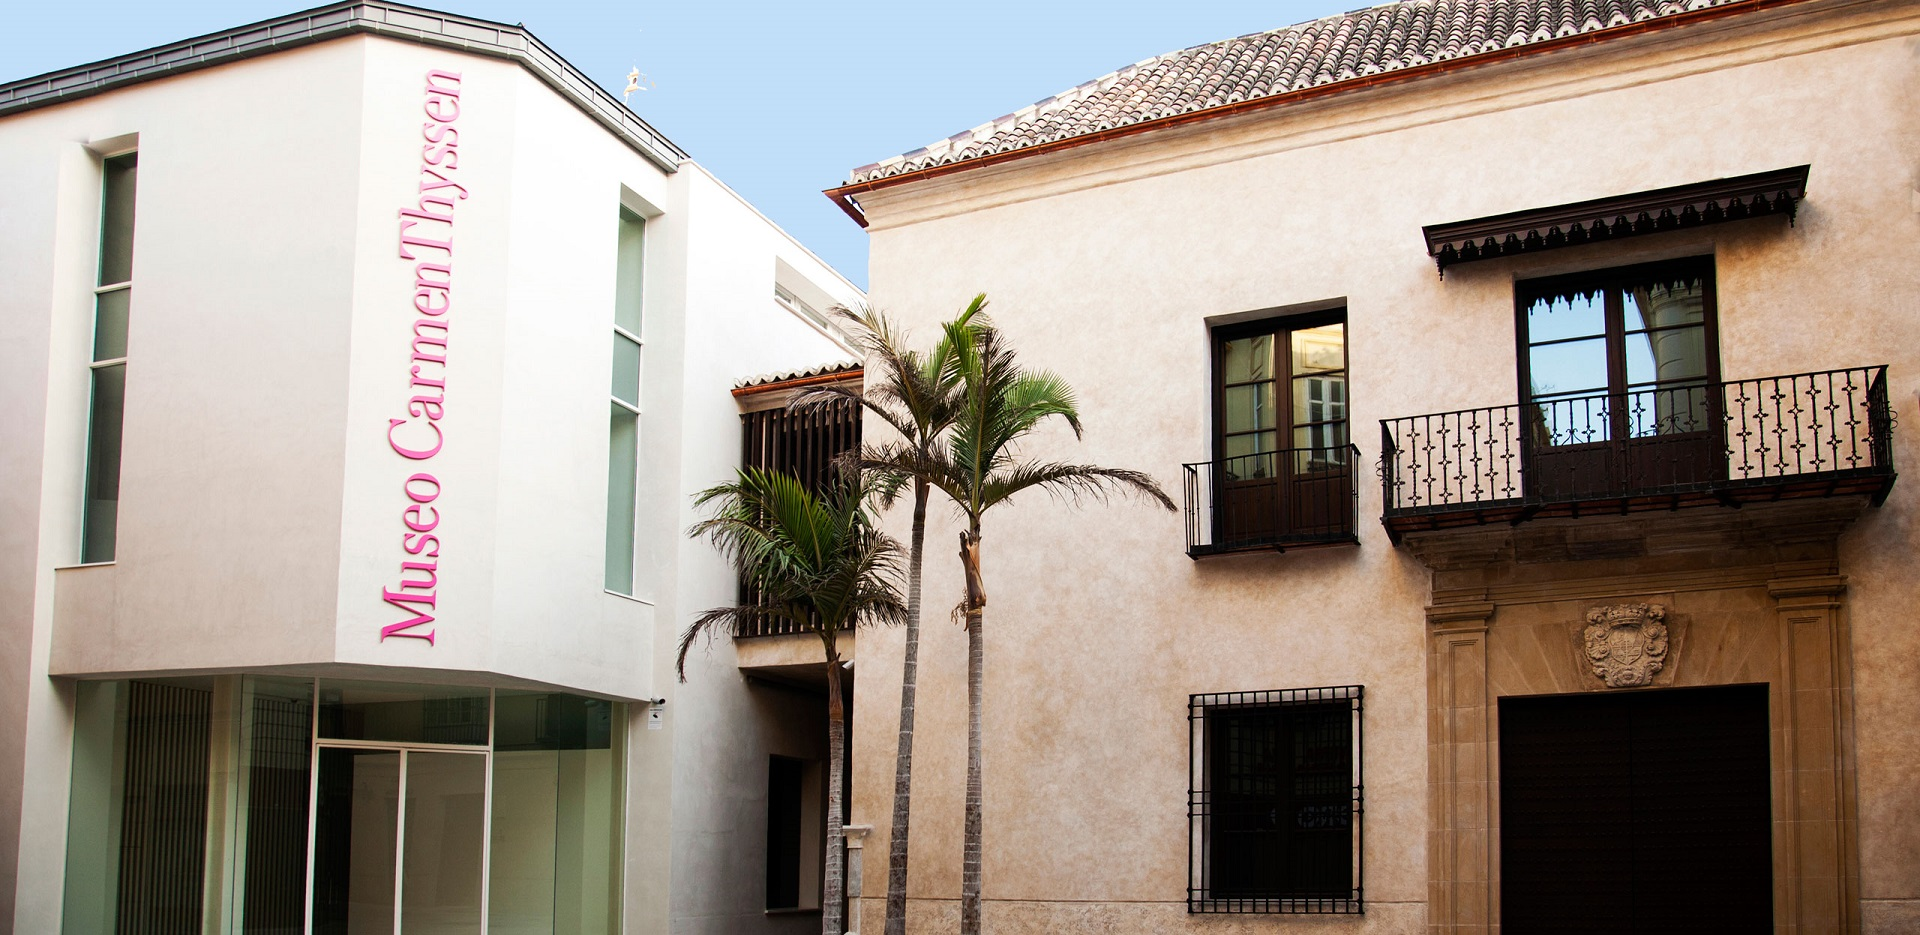 Art and Culture in Andalusia - Carmen Thyssen Museum in Malaga